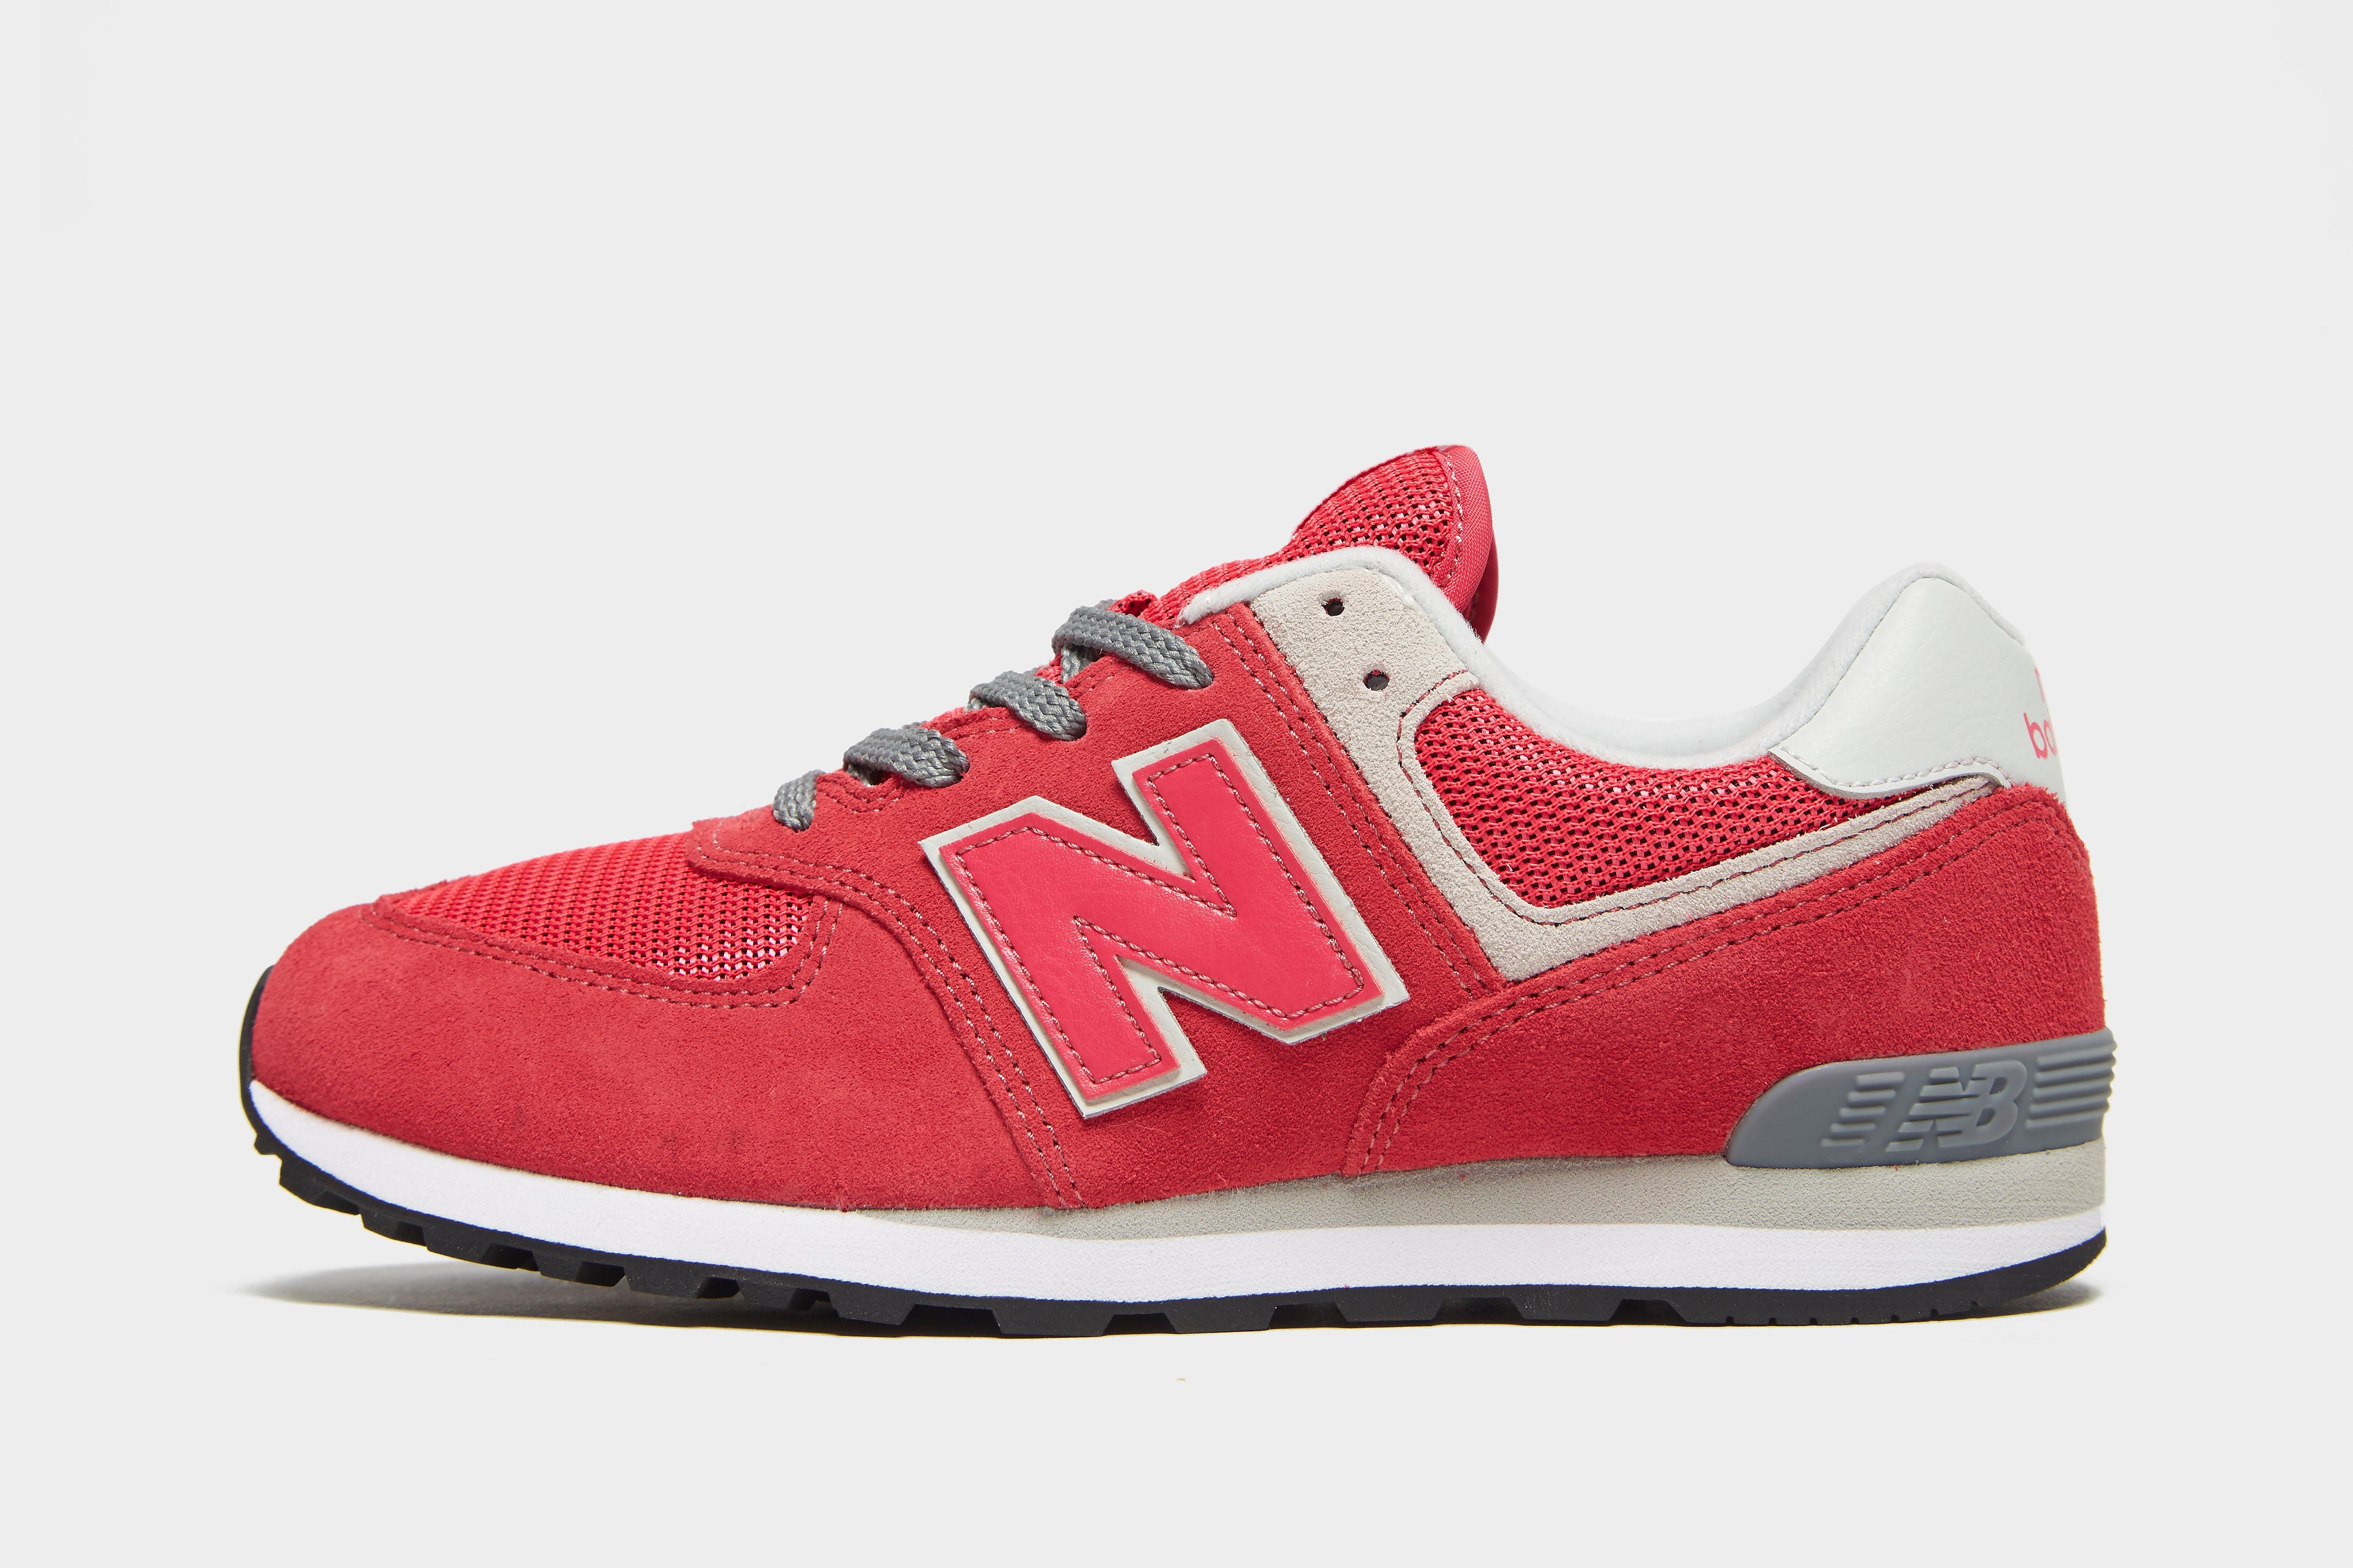 New Balance 574 kindersneaker roze en grijs